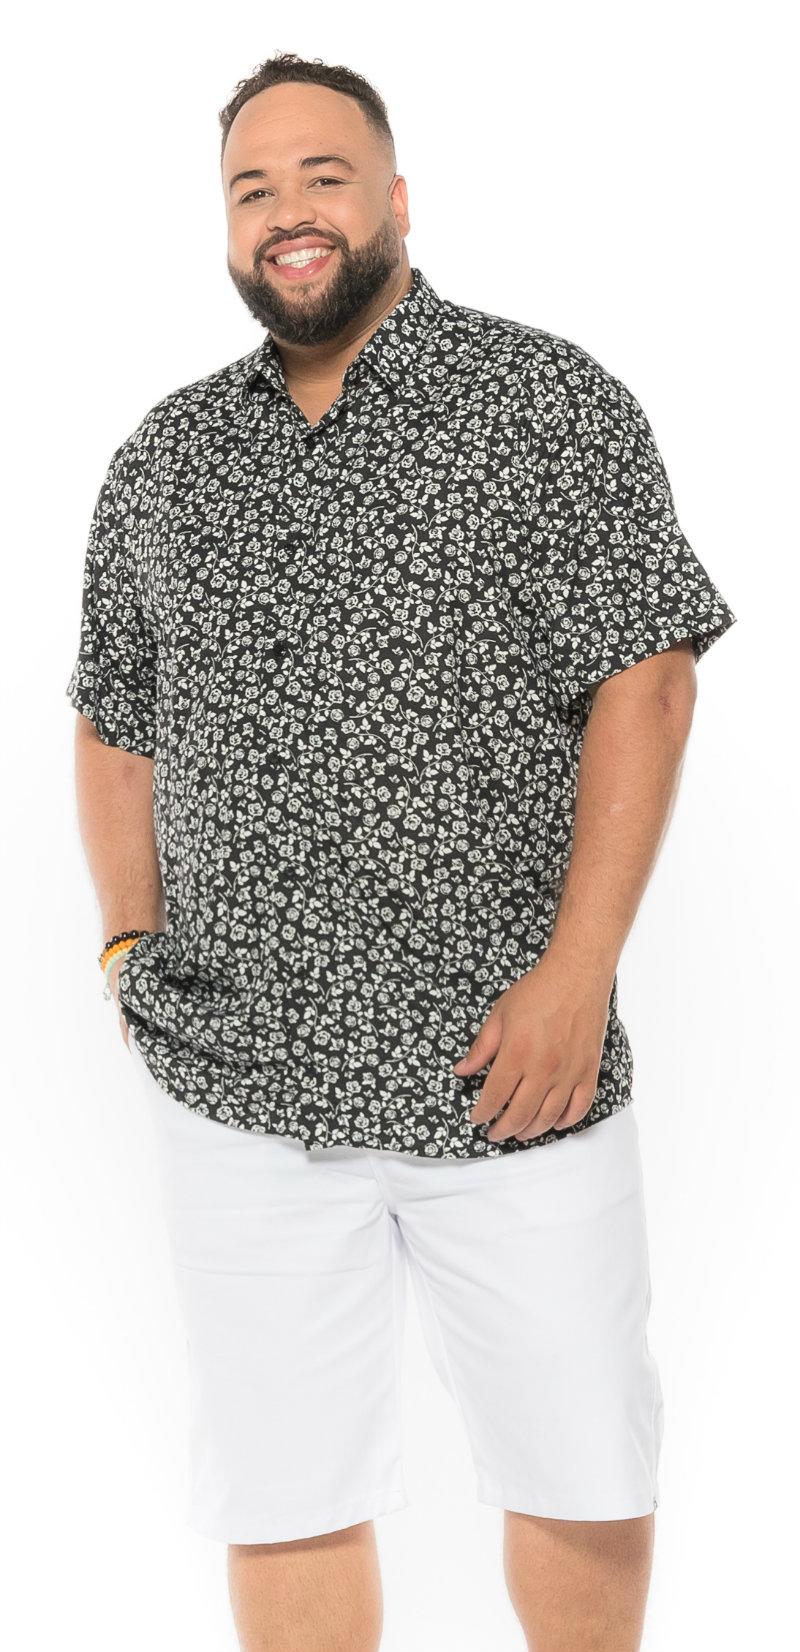 Camisa plus size Manga Curta Summer Flor Preta